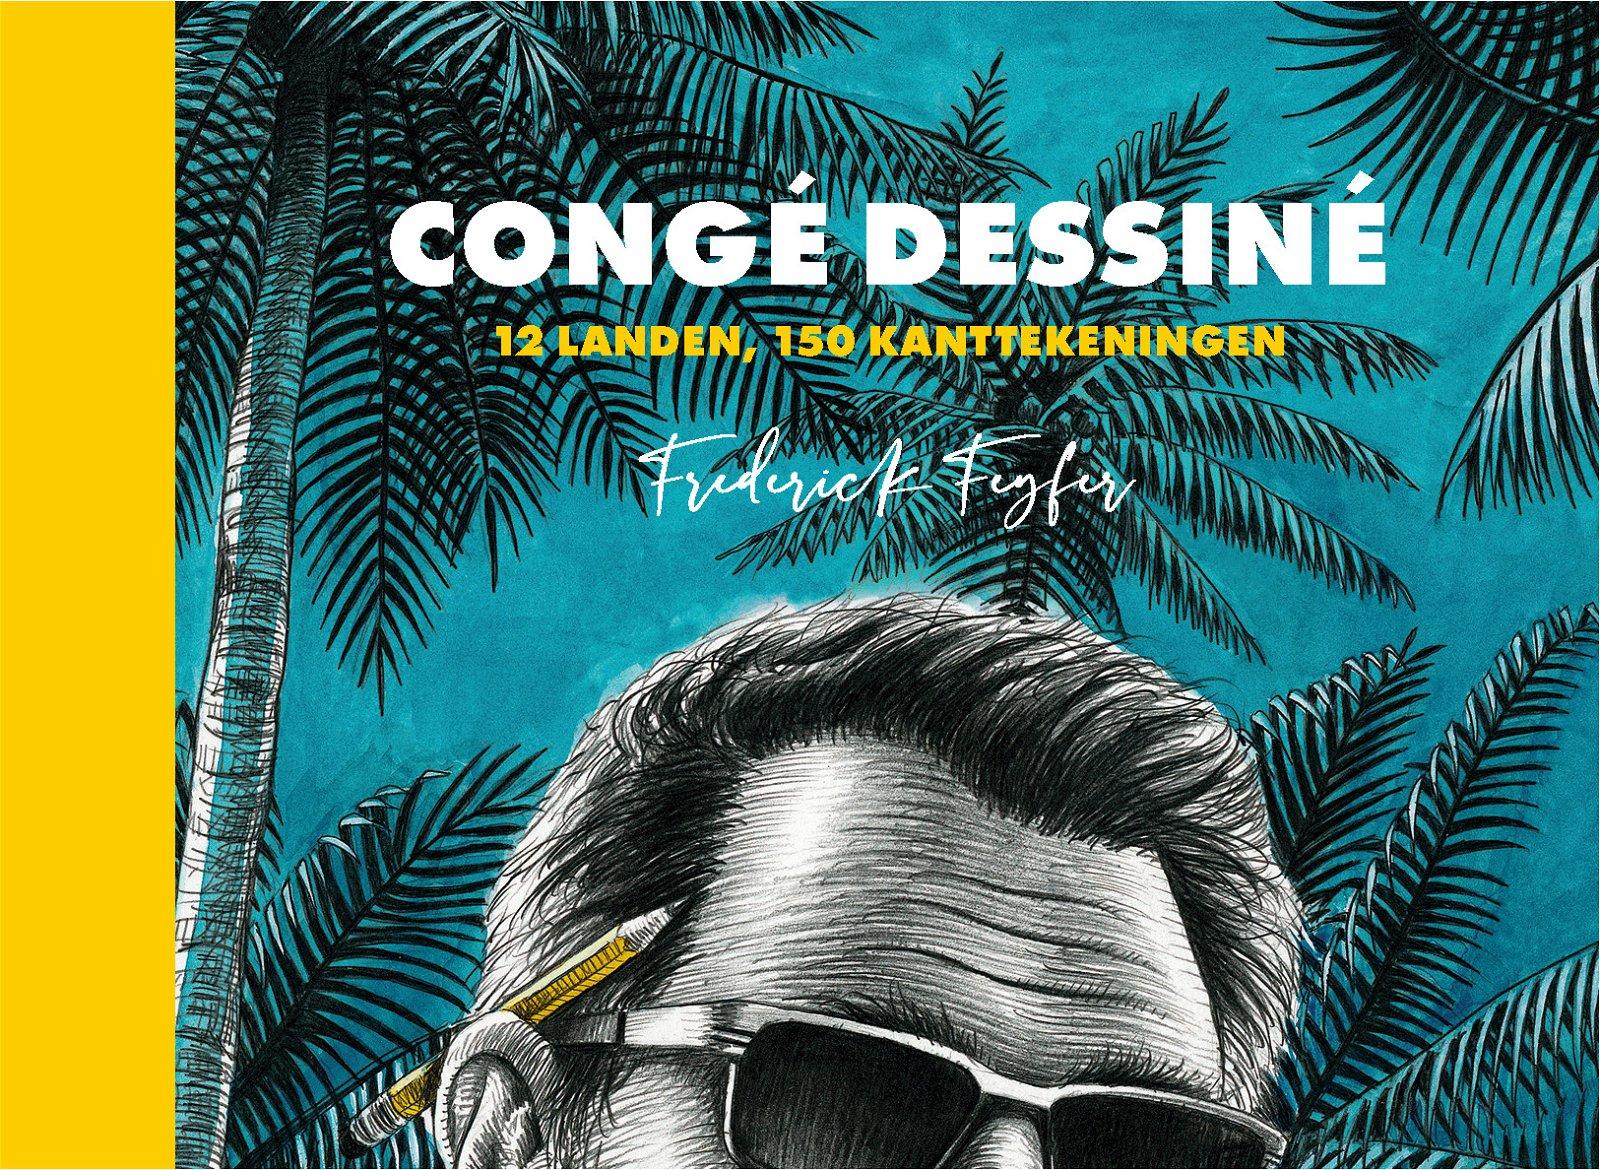 Congé Dessiné | Frederik Feyfer 9789492672278 Frederik Feyfer, Elke Lahousse Oogachtend   Fotoboeken, Reisverhalen Wereld als geheel